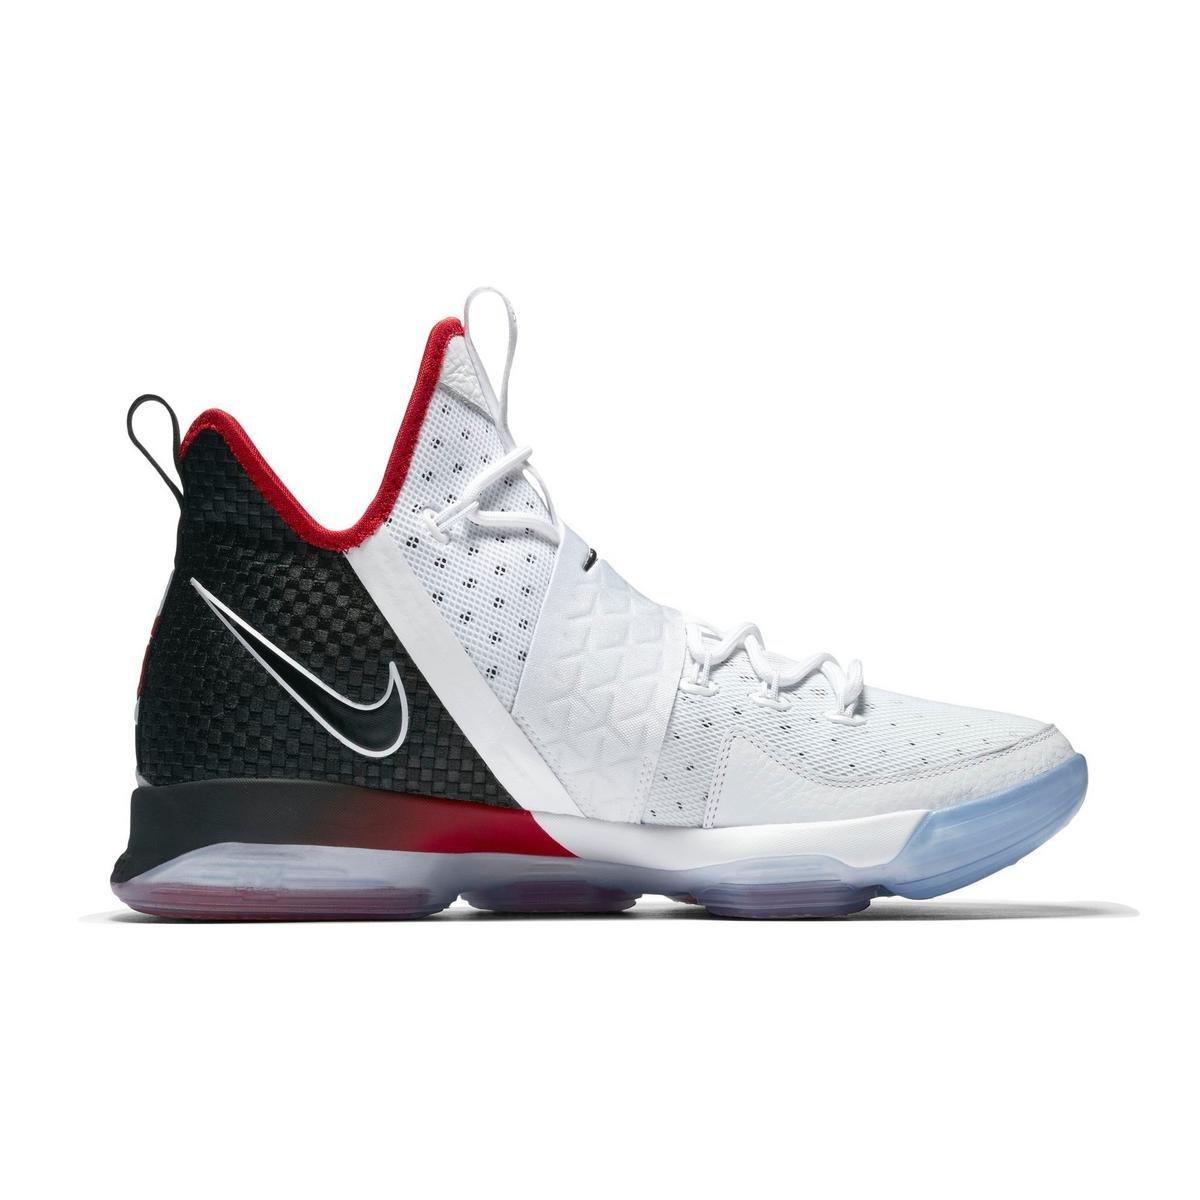 buy online 424e7 599a8 NIKE Lebron XIV (GS) Youth Basketball Shoe White/Black University Red 7Y